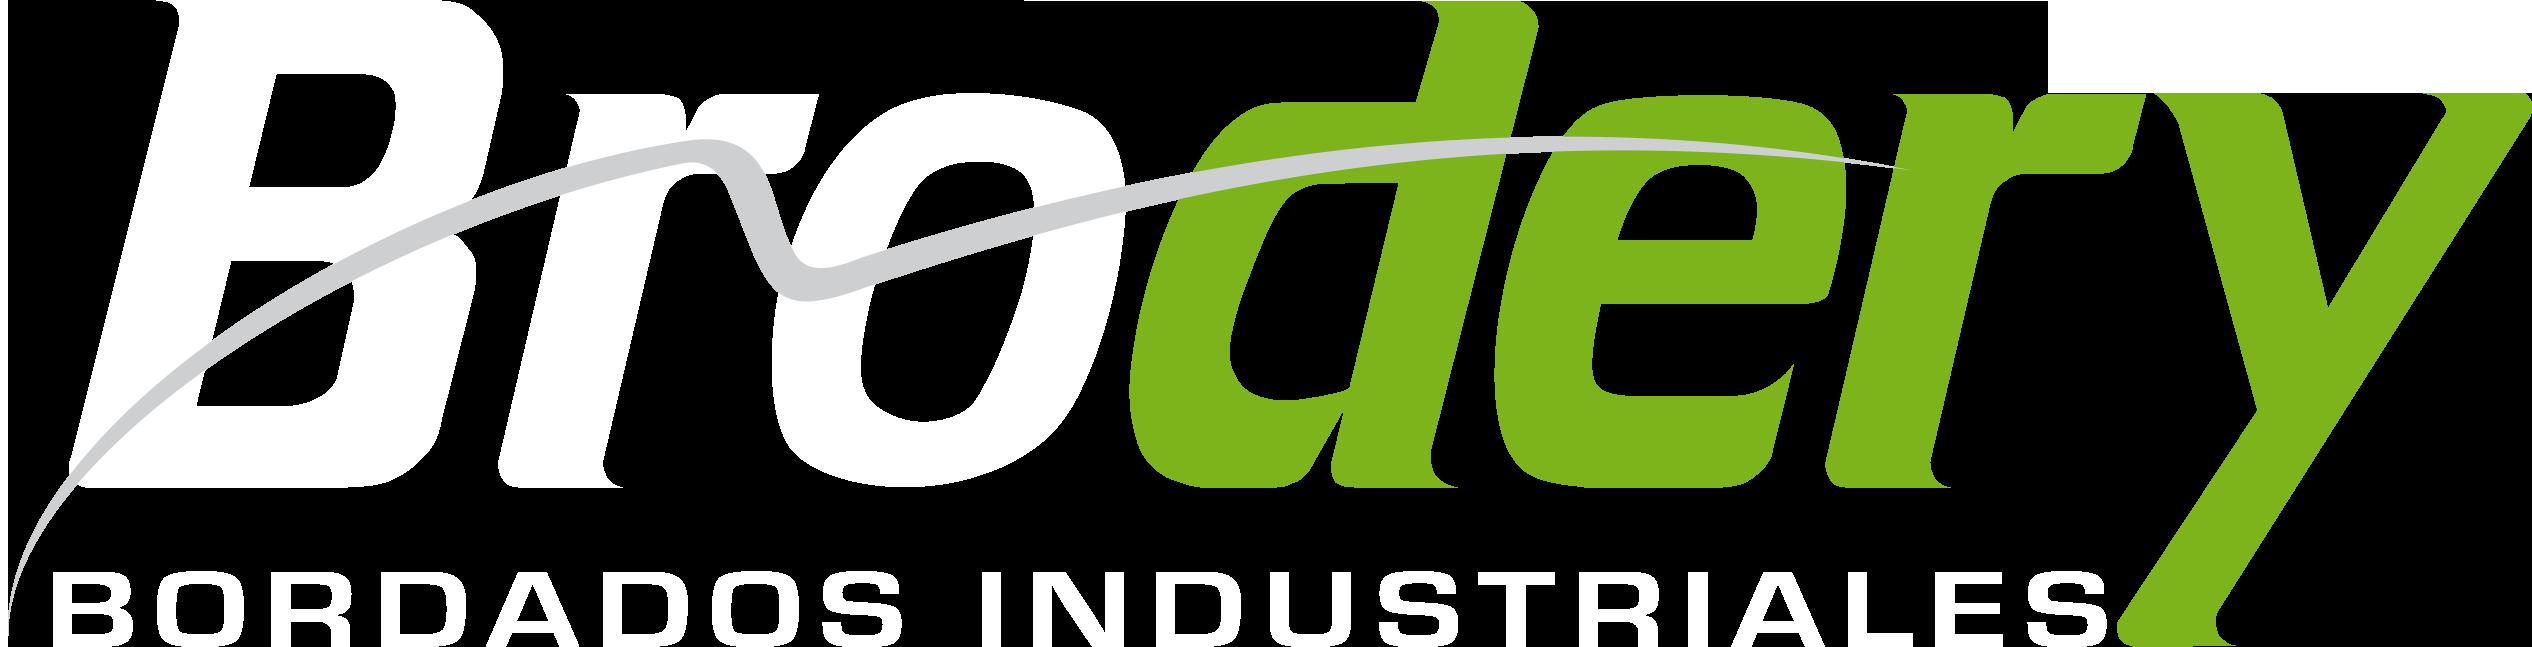 Logo_Brodery_V2